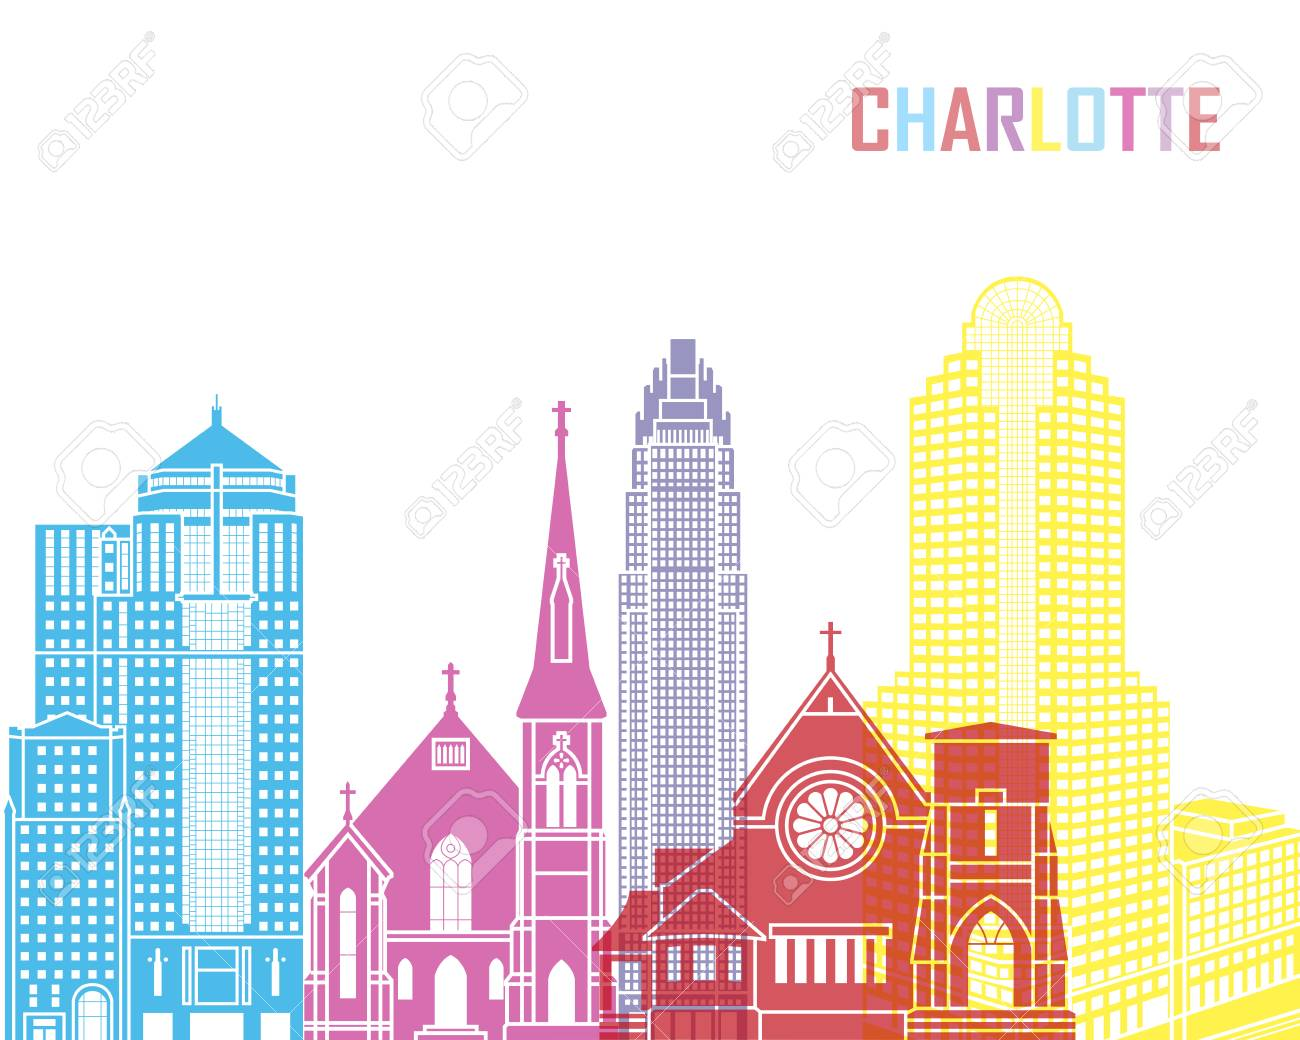 Charlotte skyline pop in editable vector file.